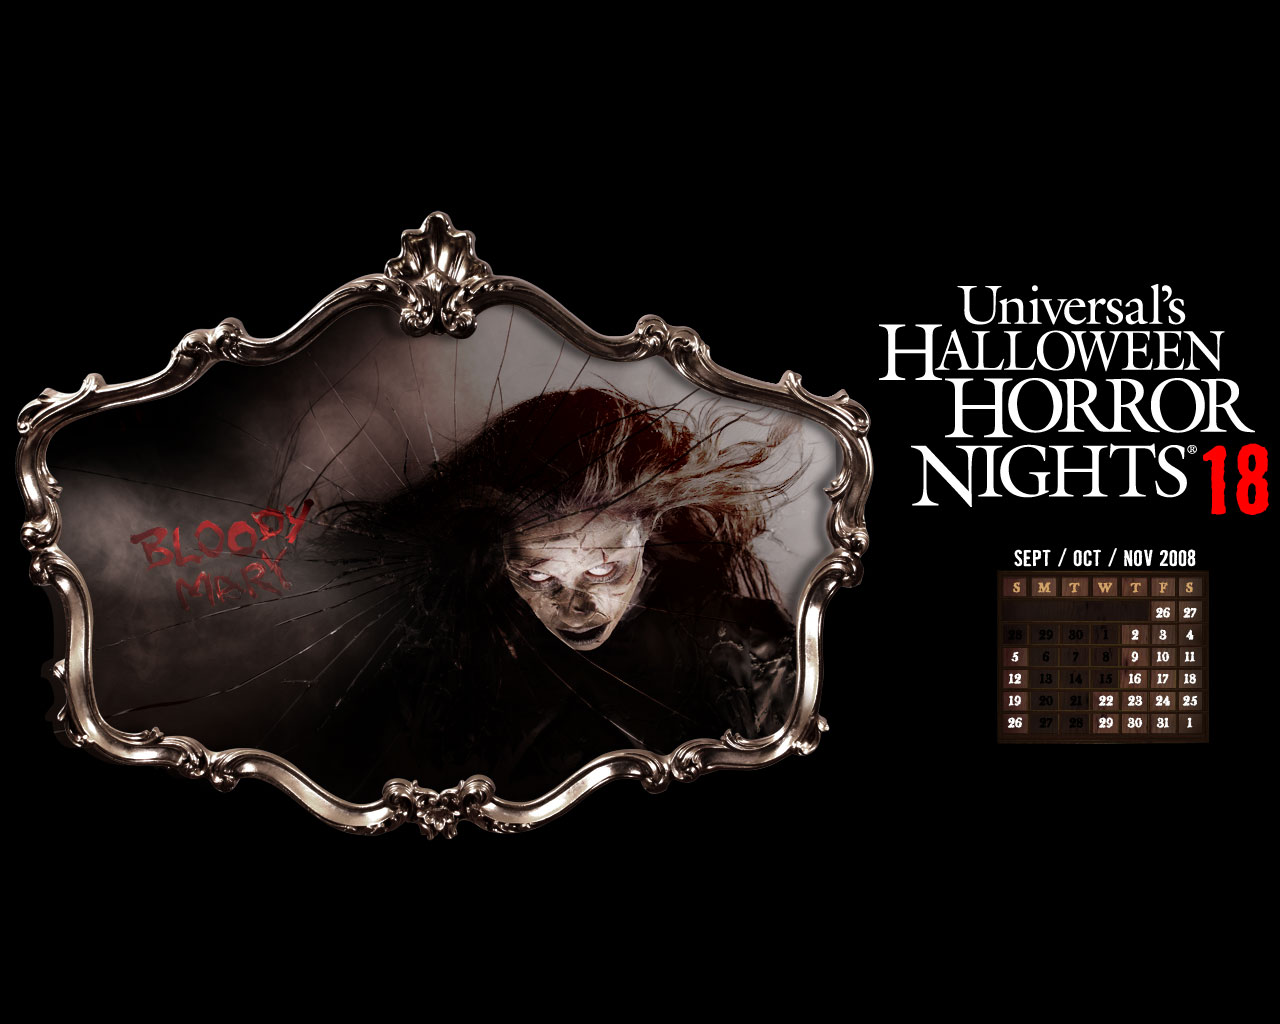 Halloween Horror Nights at Universal Studios Florida 1280x1024